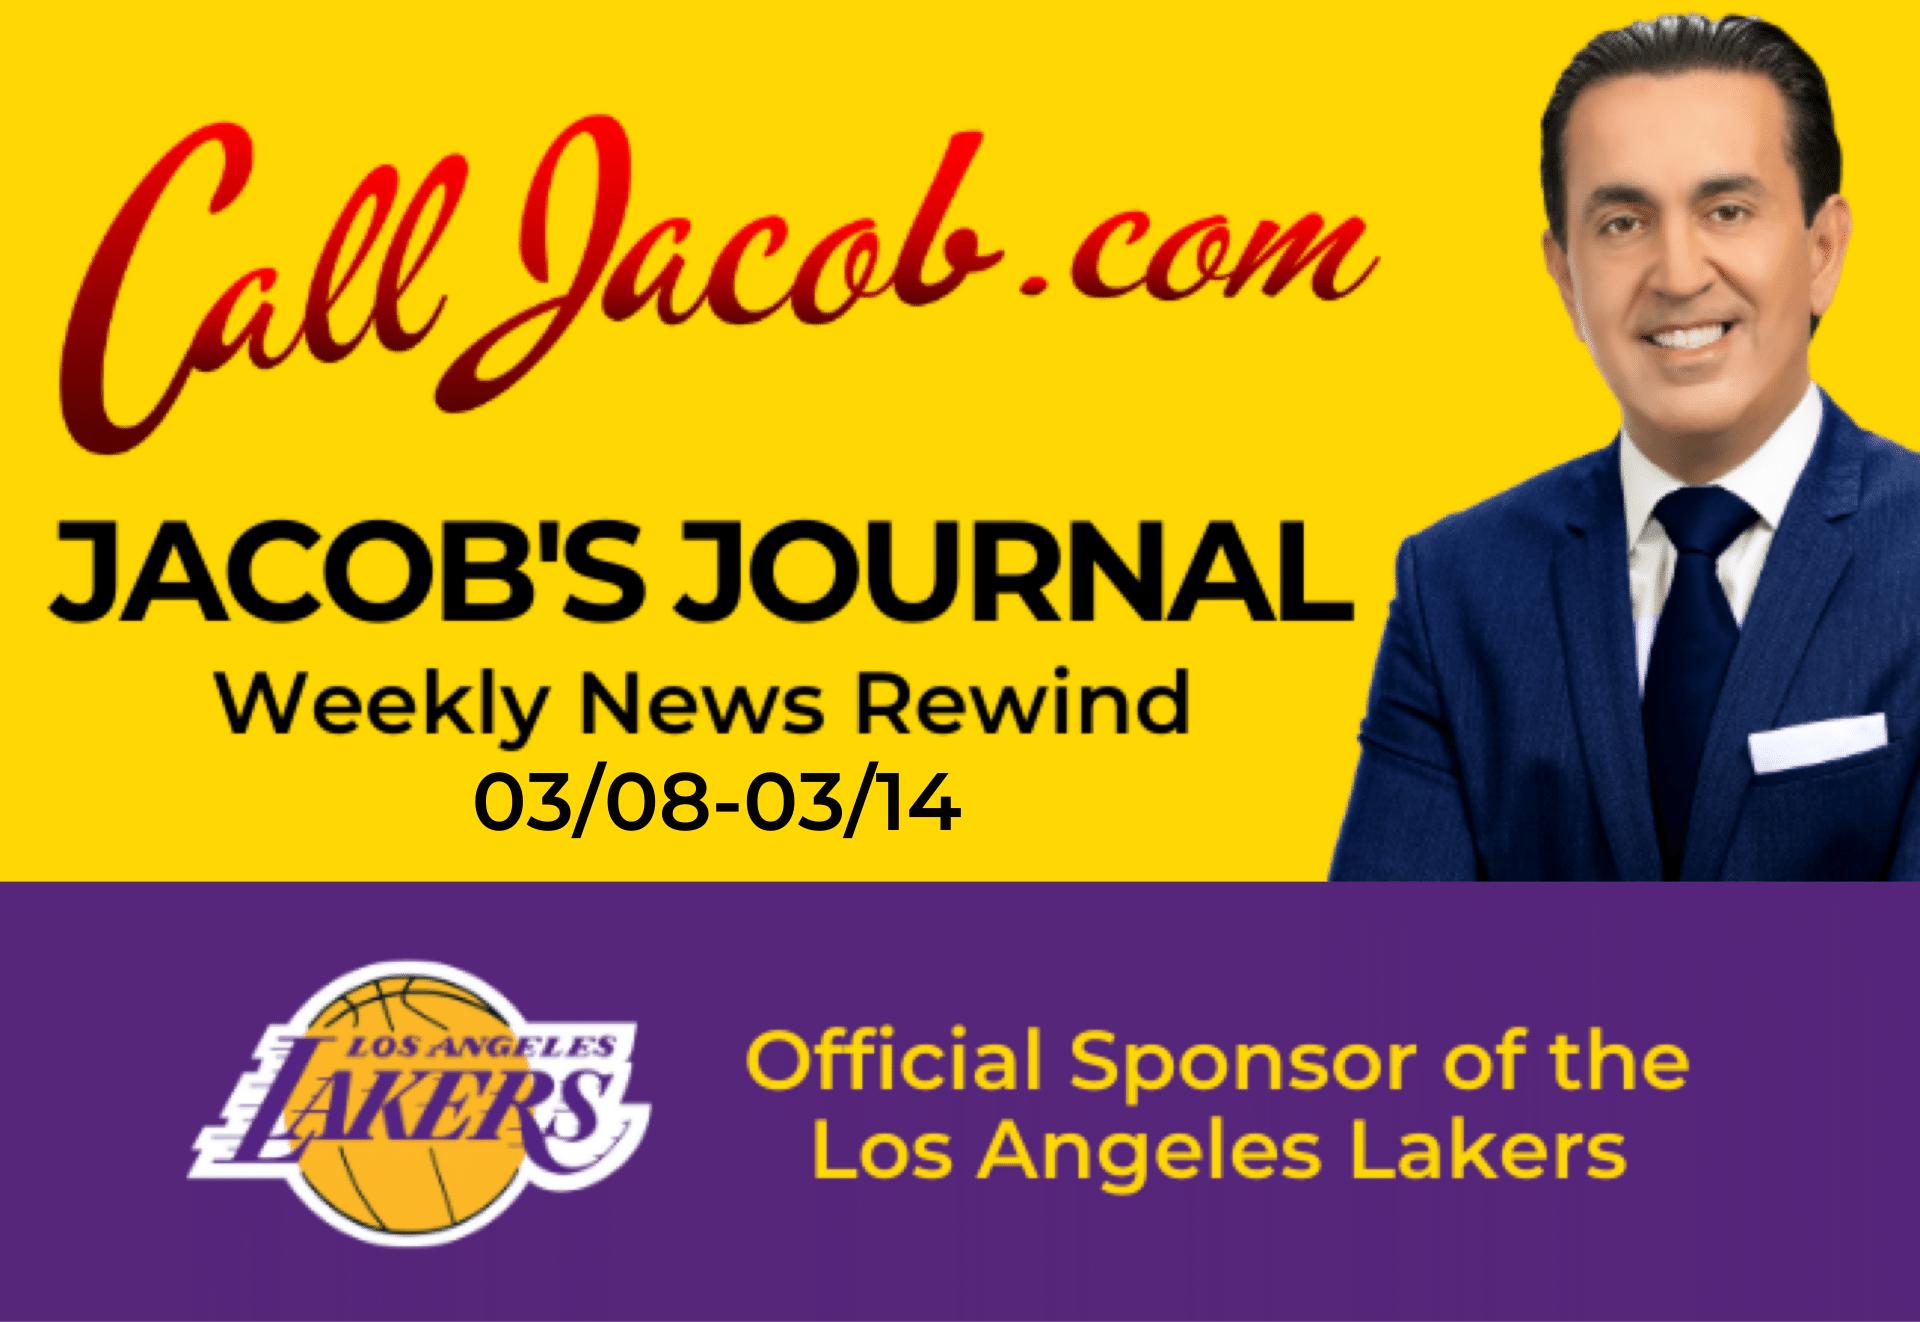 JacobsJournalWeeklyNewsRewind March 8th to March 14th 2021